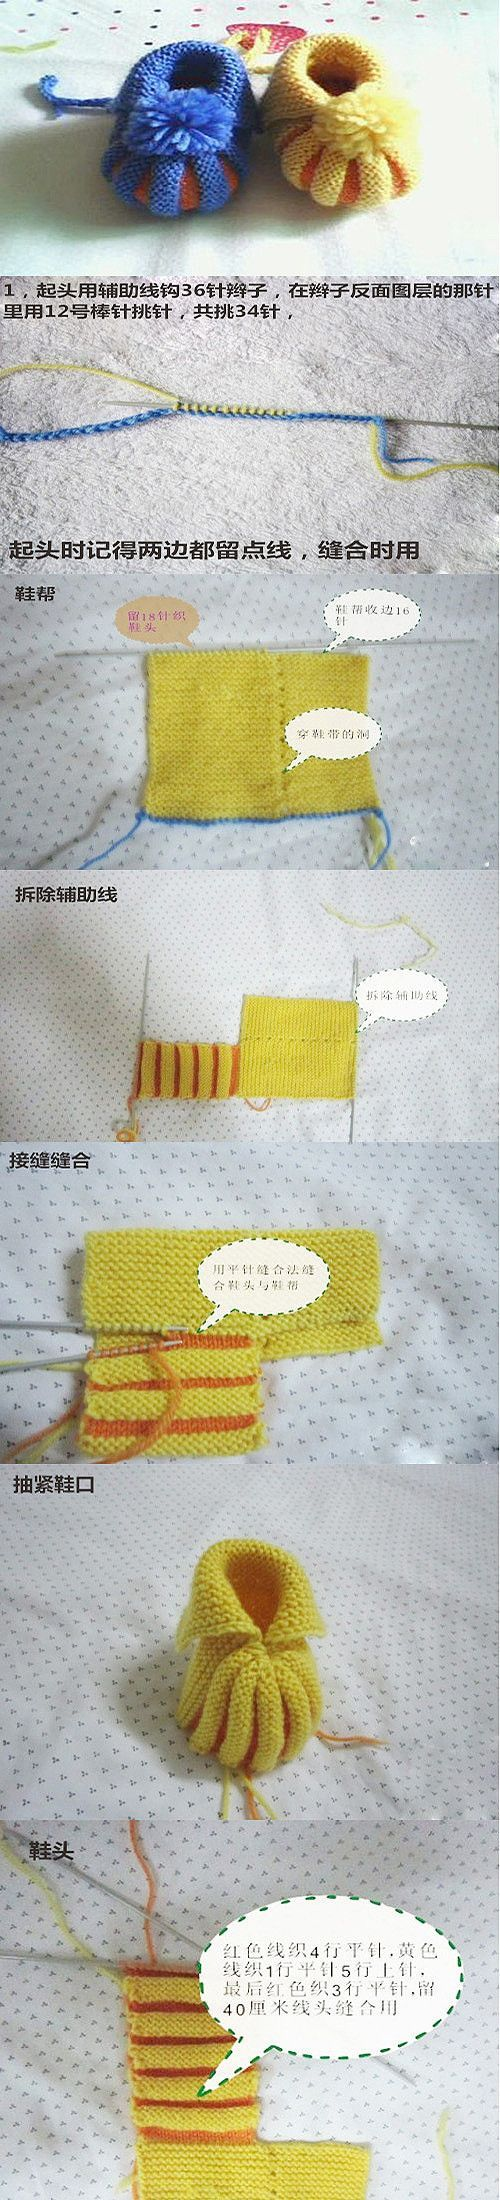 DIY Booties..someone please translate. So cute!